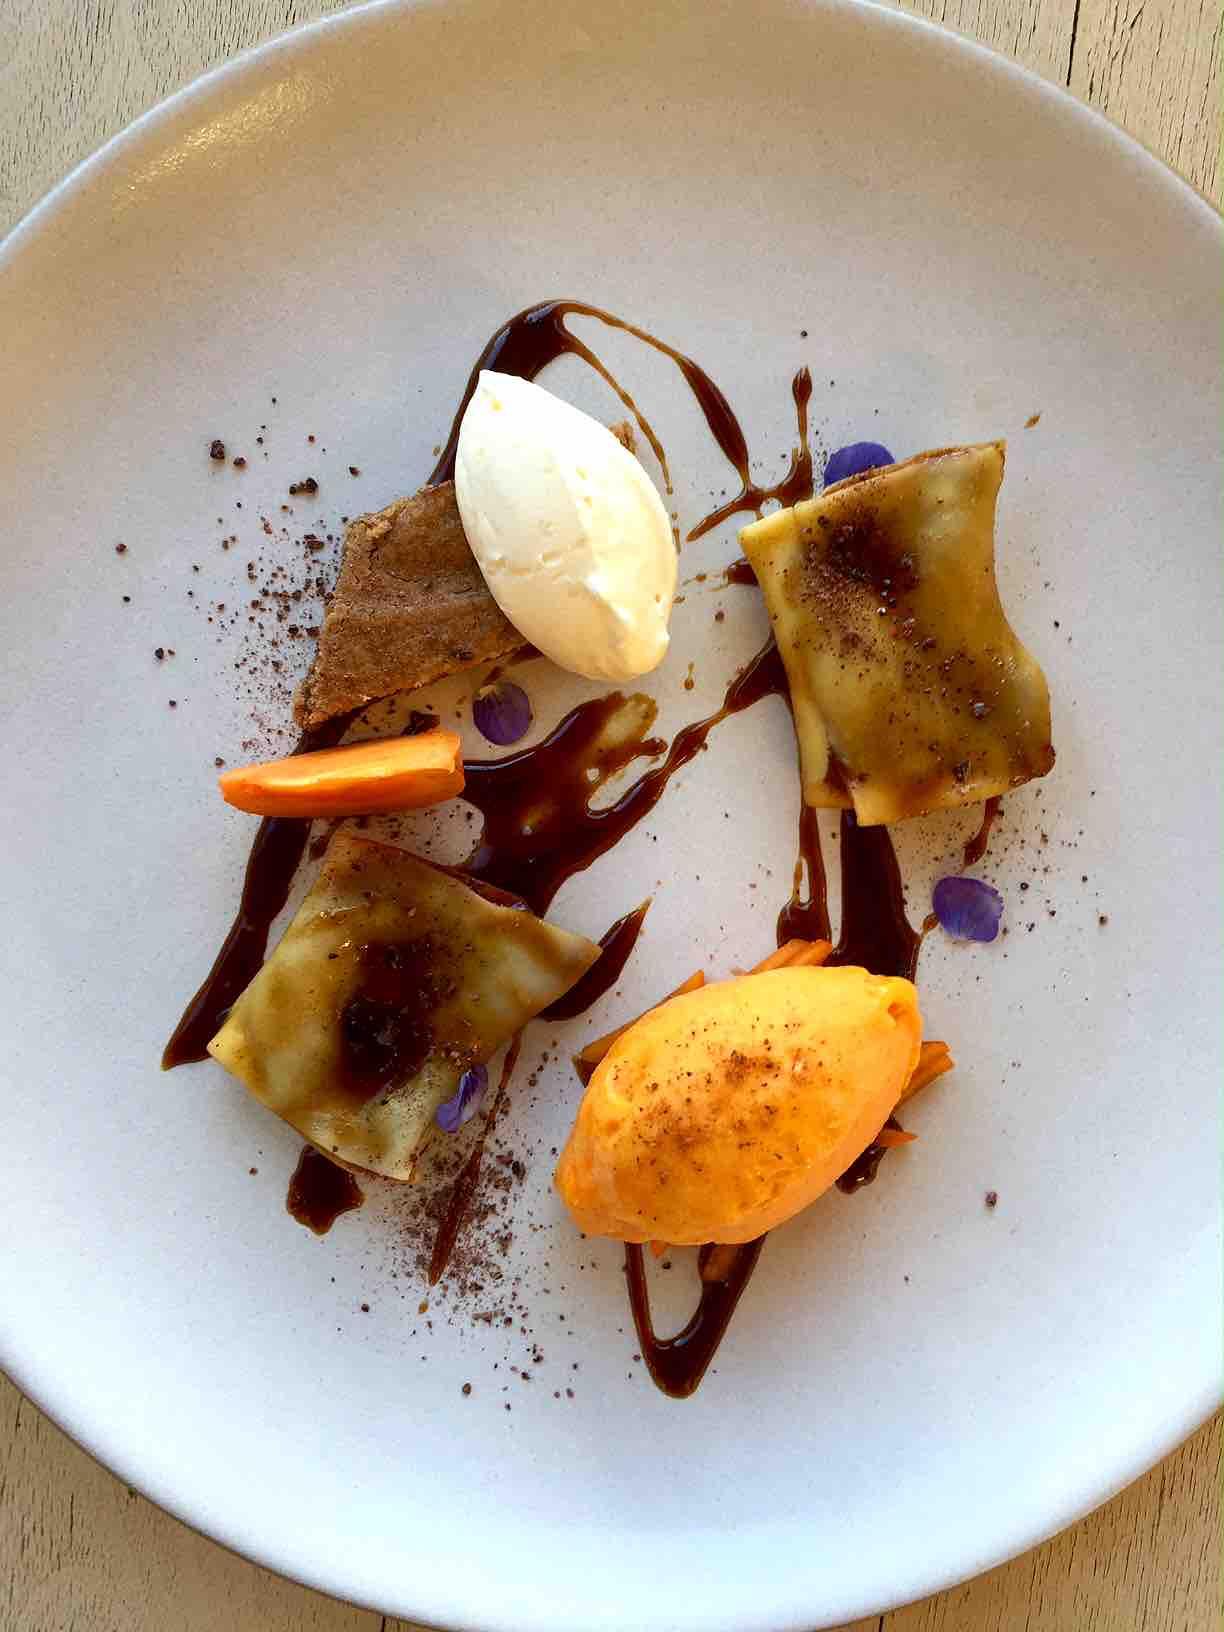 Honey Ganache ravioli with persimmon and chestnut